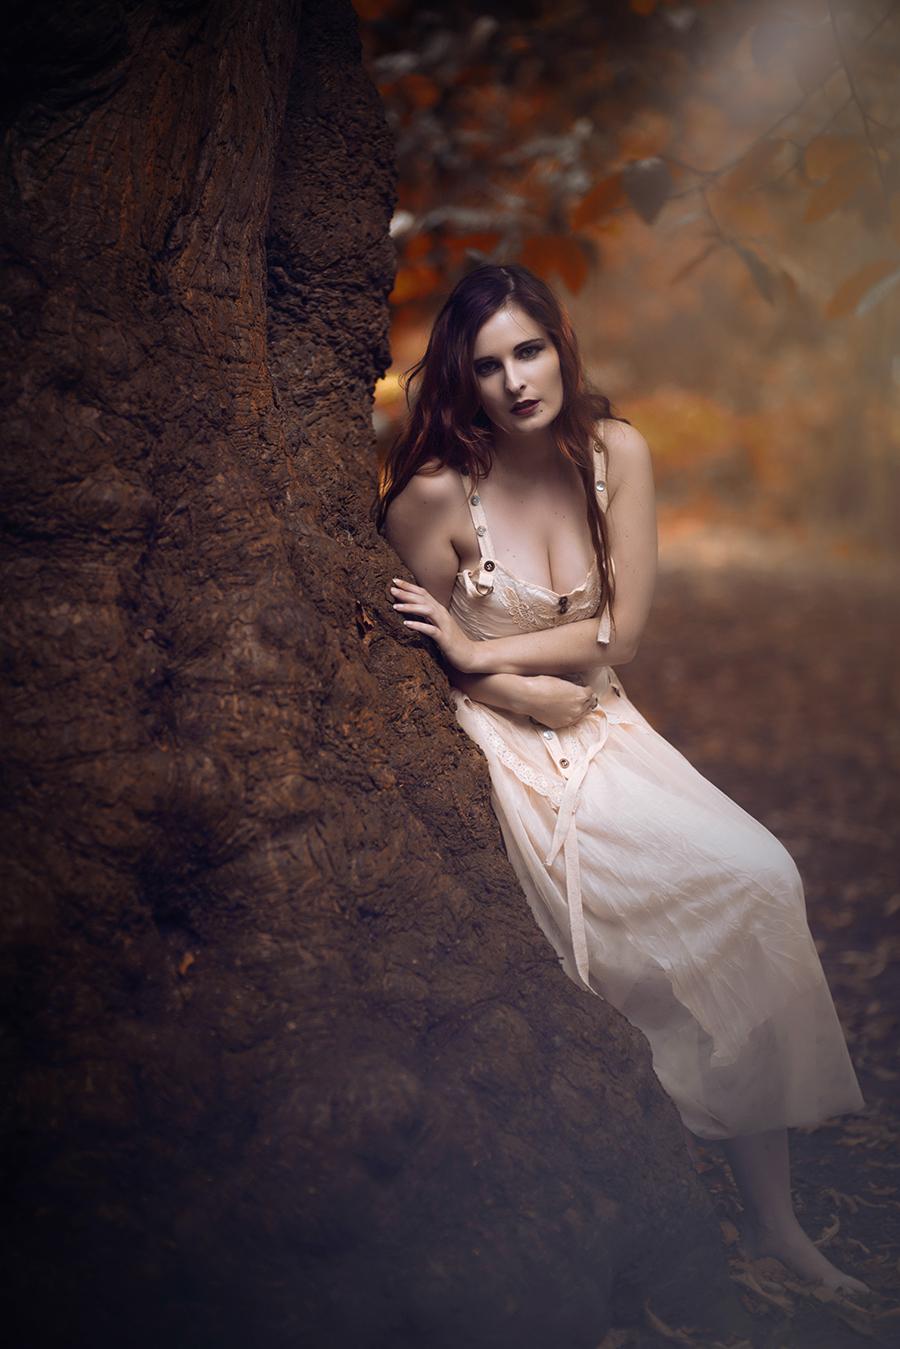 Marianne Di Vine Autumn / Photography by TK300, Model Marianne Di Vine / Uploaded 30th October 2016 @ 04:59 PM